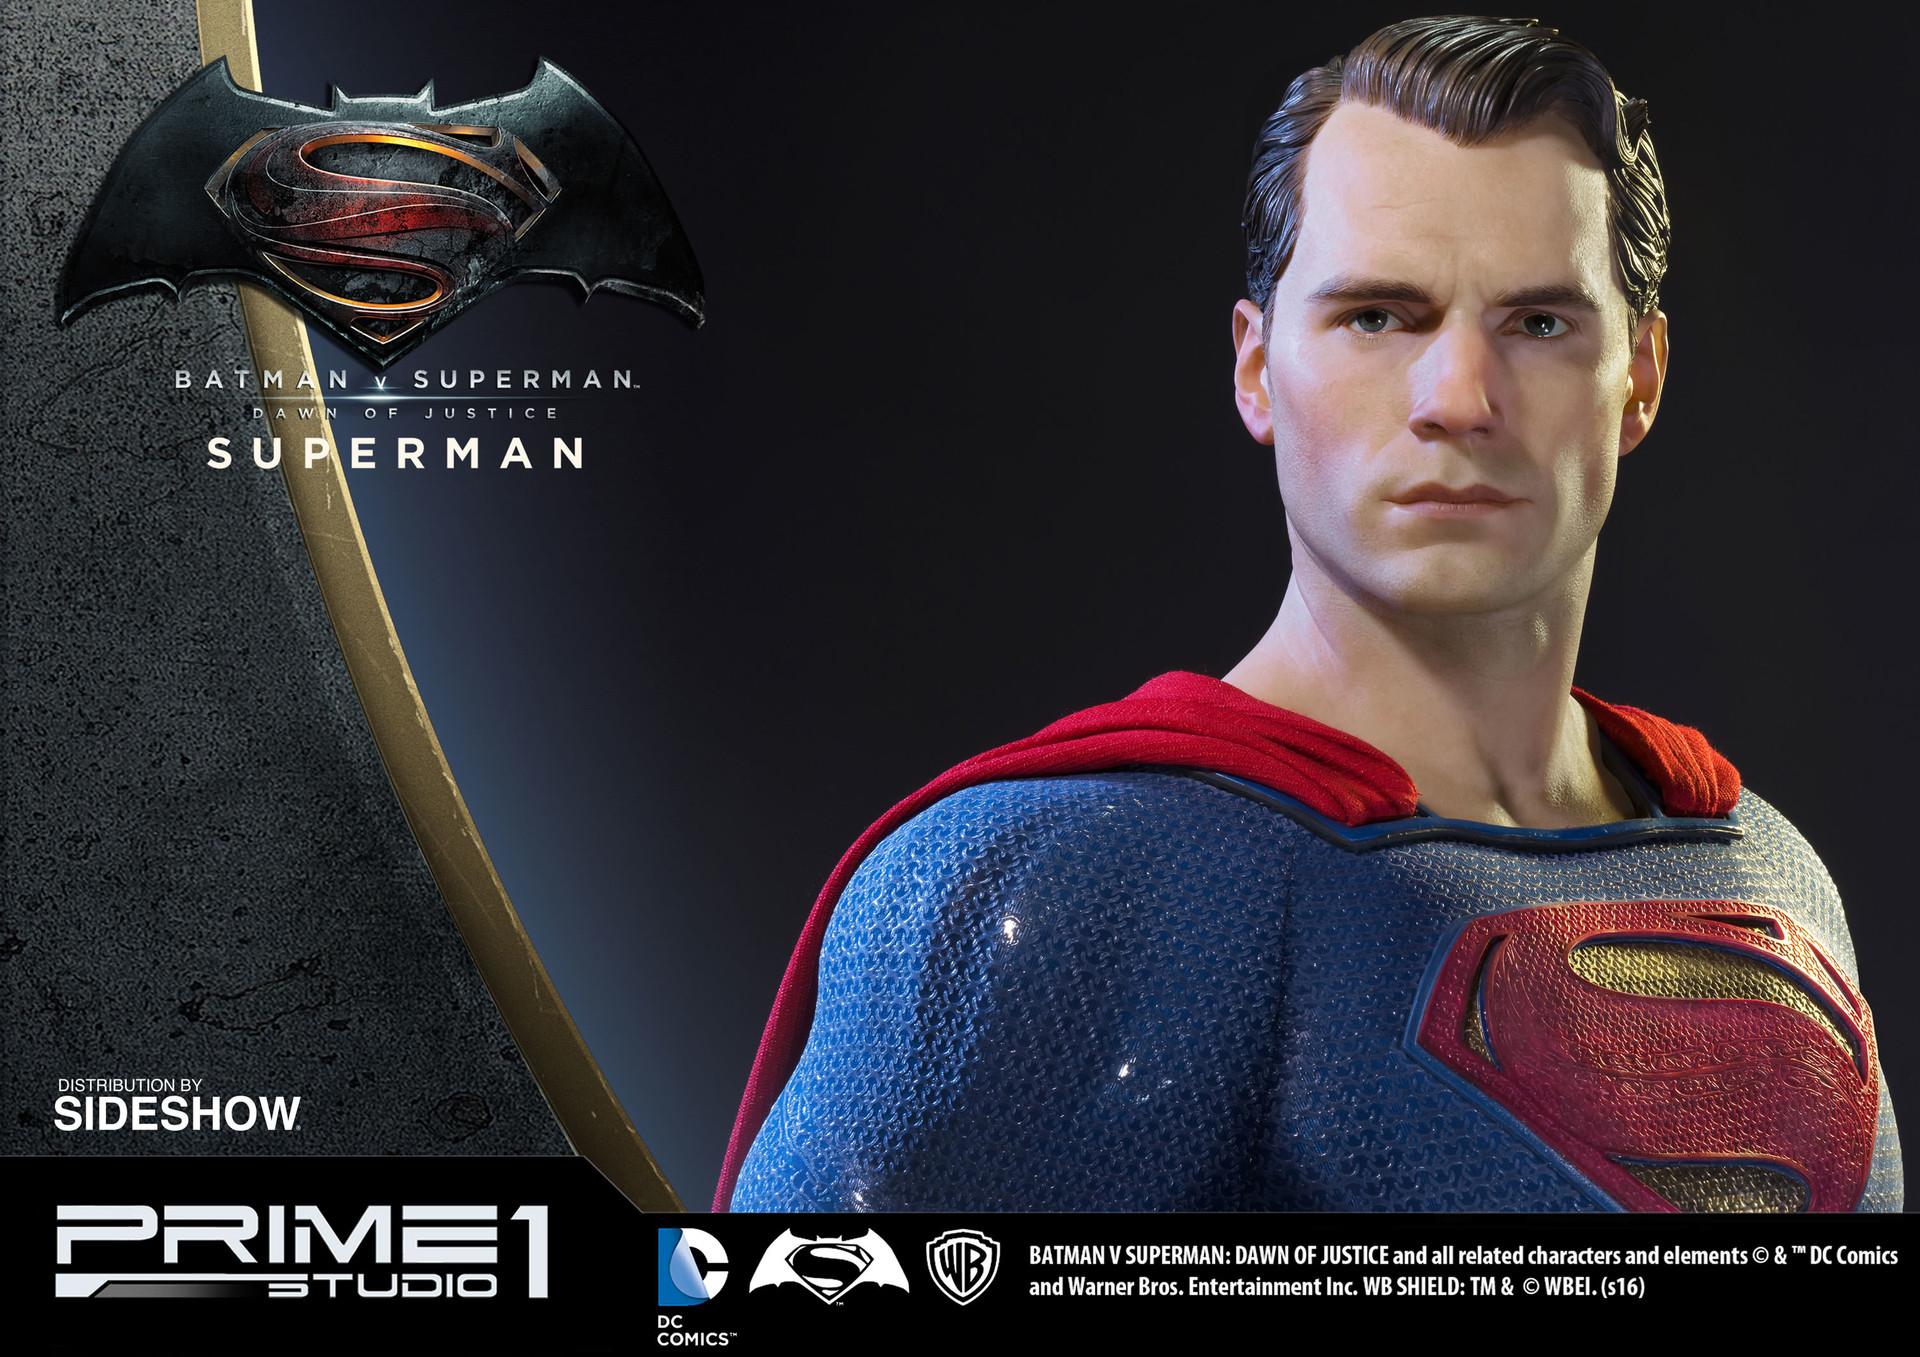 Alvaro ribeiro dc comics batman v superman superman half scale polystone statue prime 1 902664 11